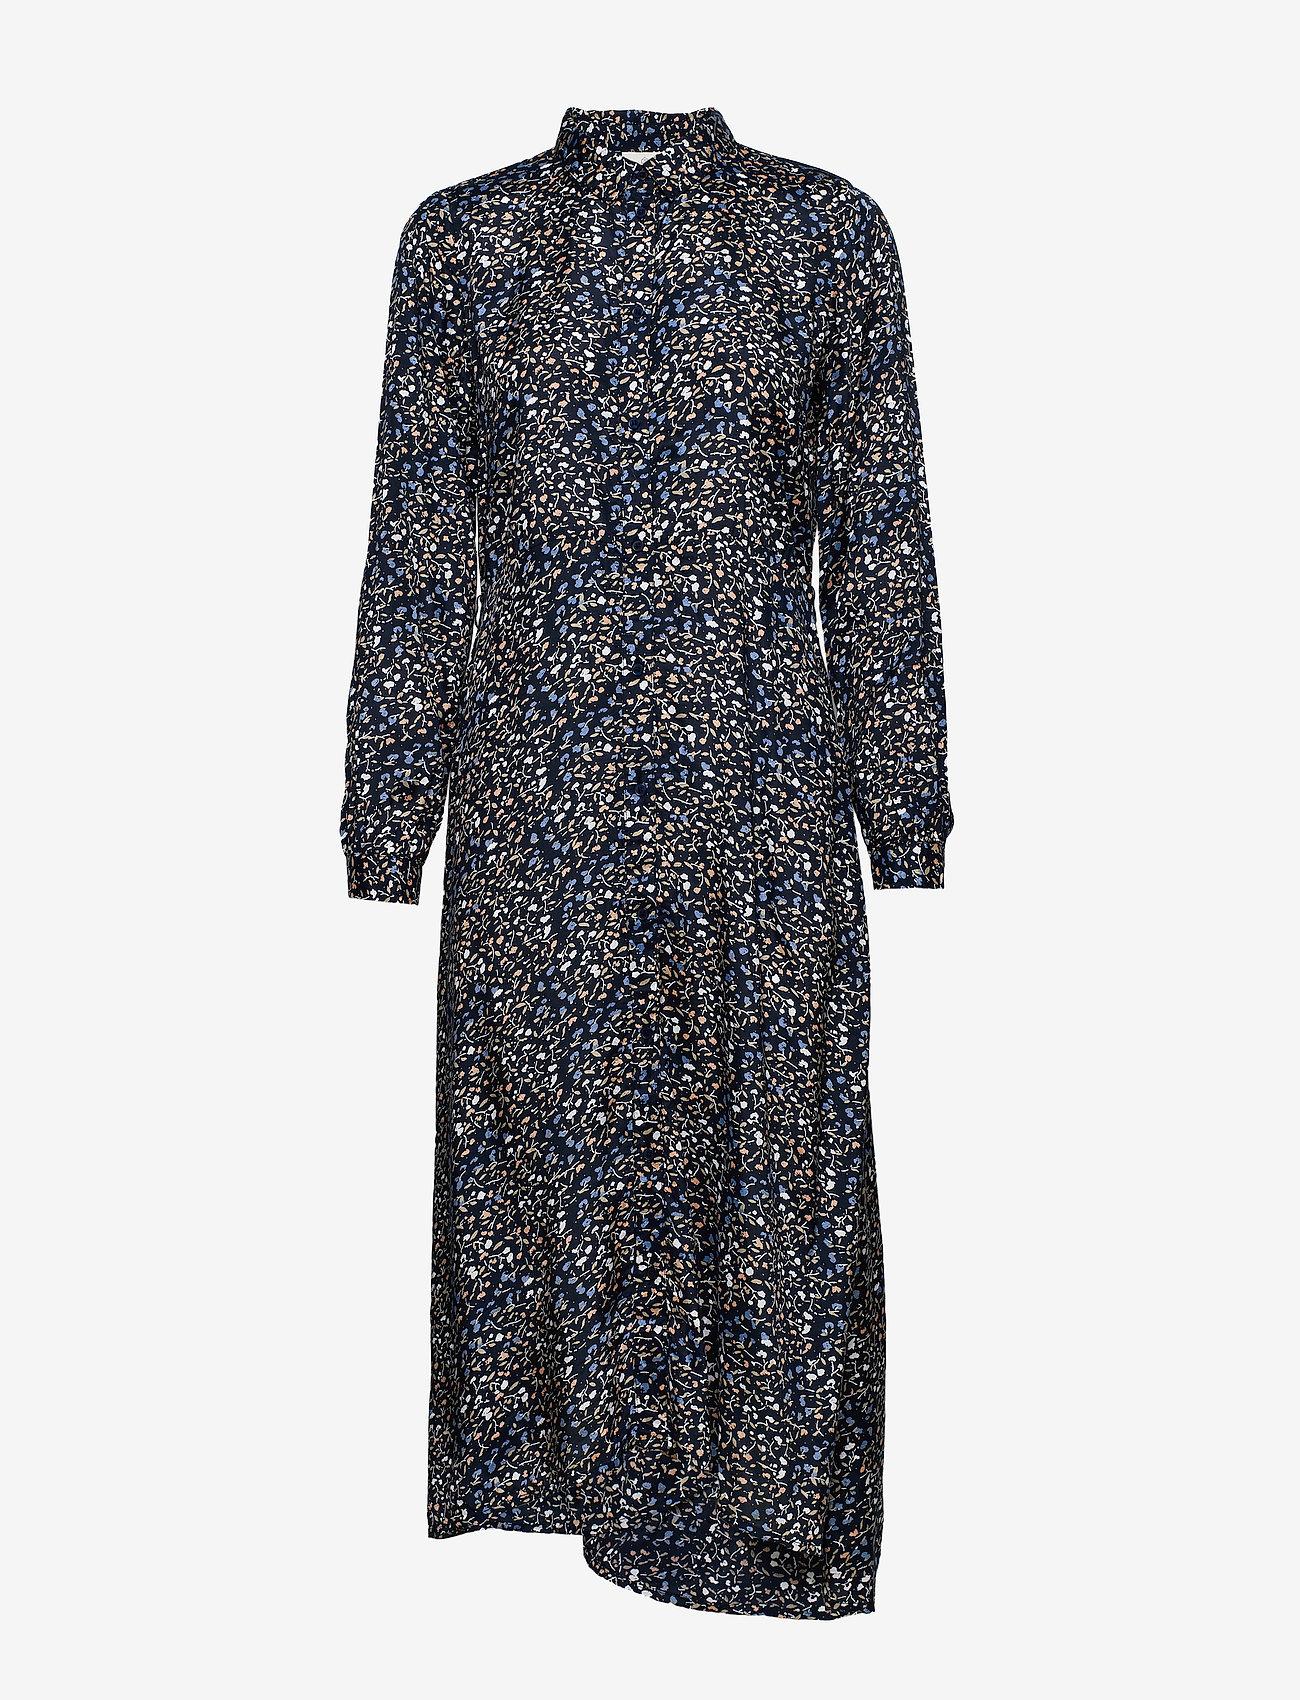 Kaaline Shirt Dress (Midnight Marine) (55.97 €) - Kaffe VvOdWpJR